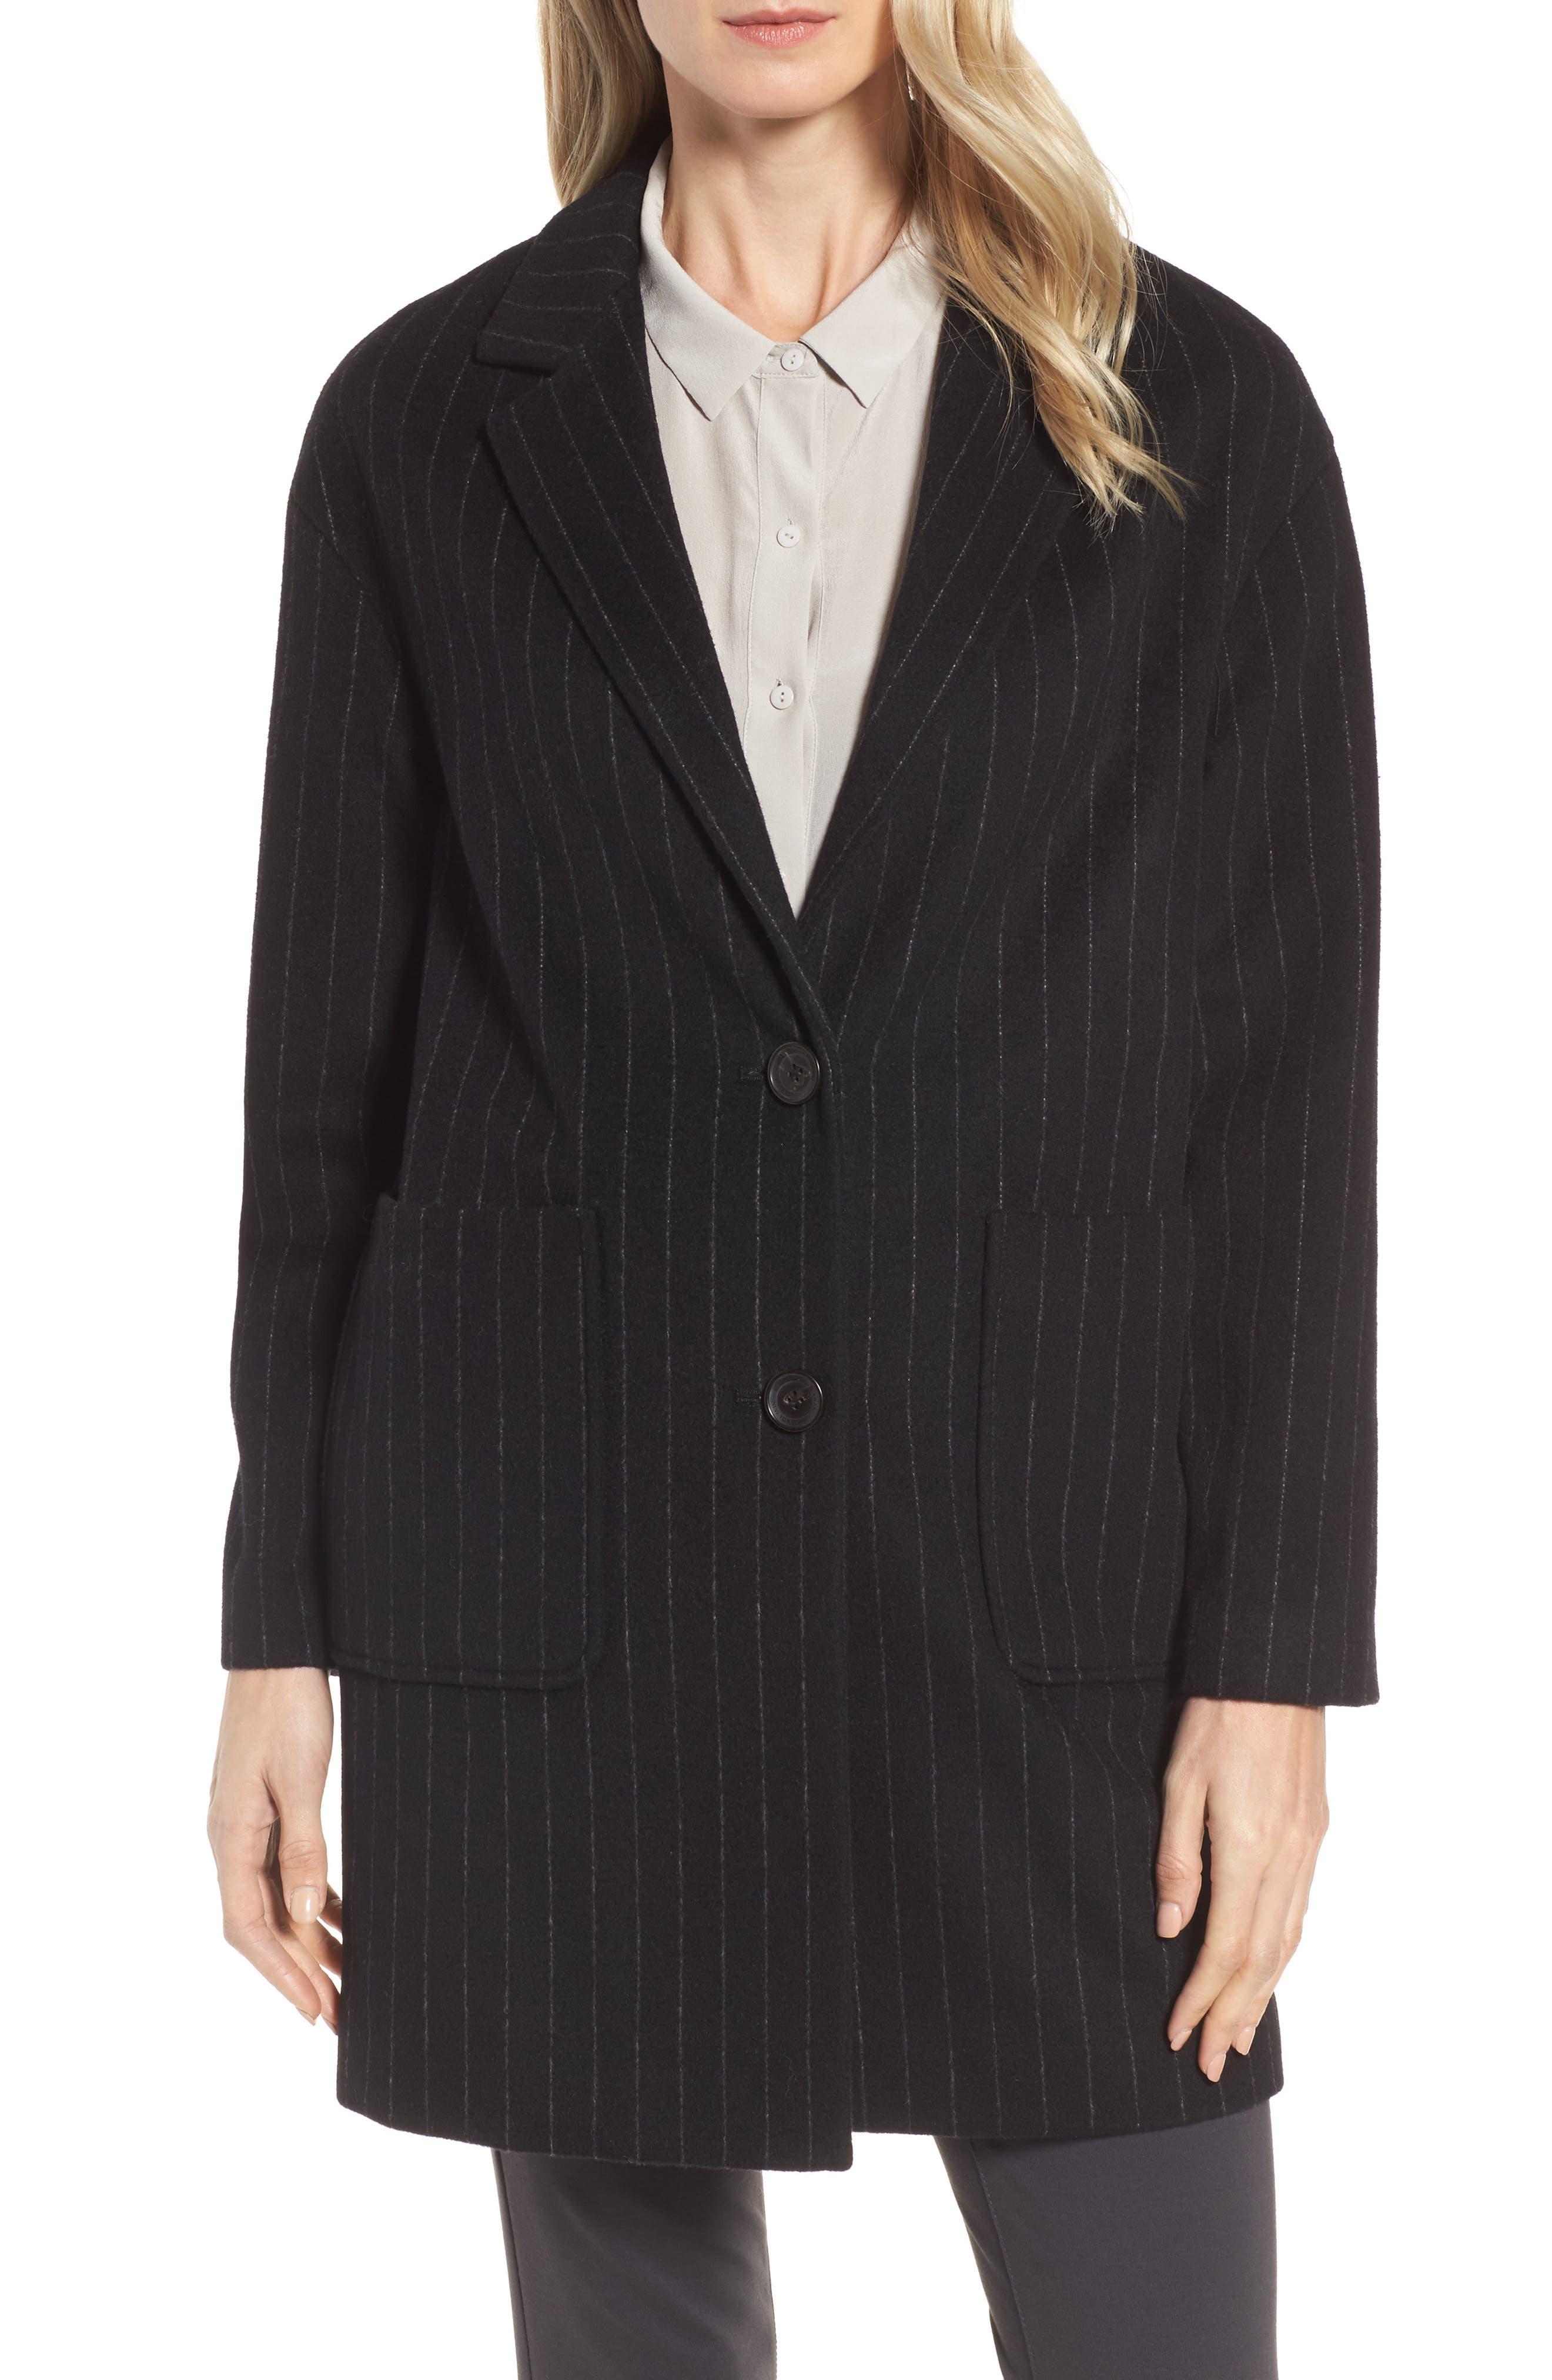 DKNY Pinstripe Wool Blend Coat,                             Main thumbnail 1, color,                             Black